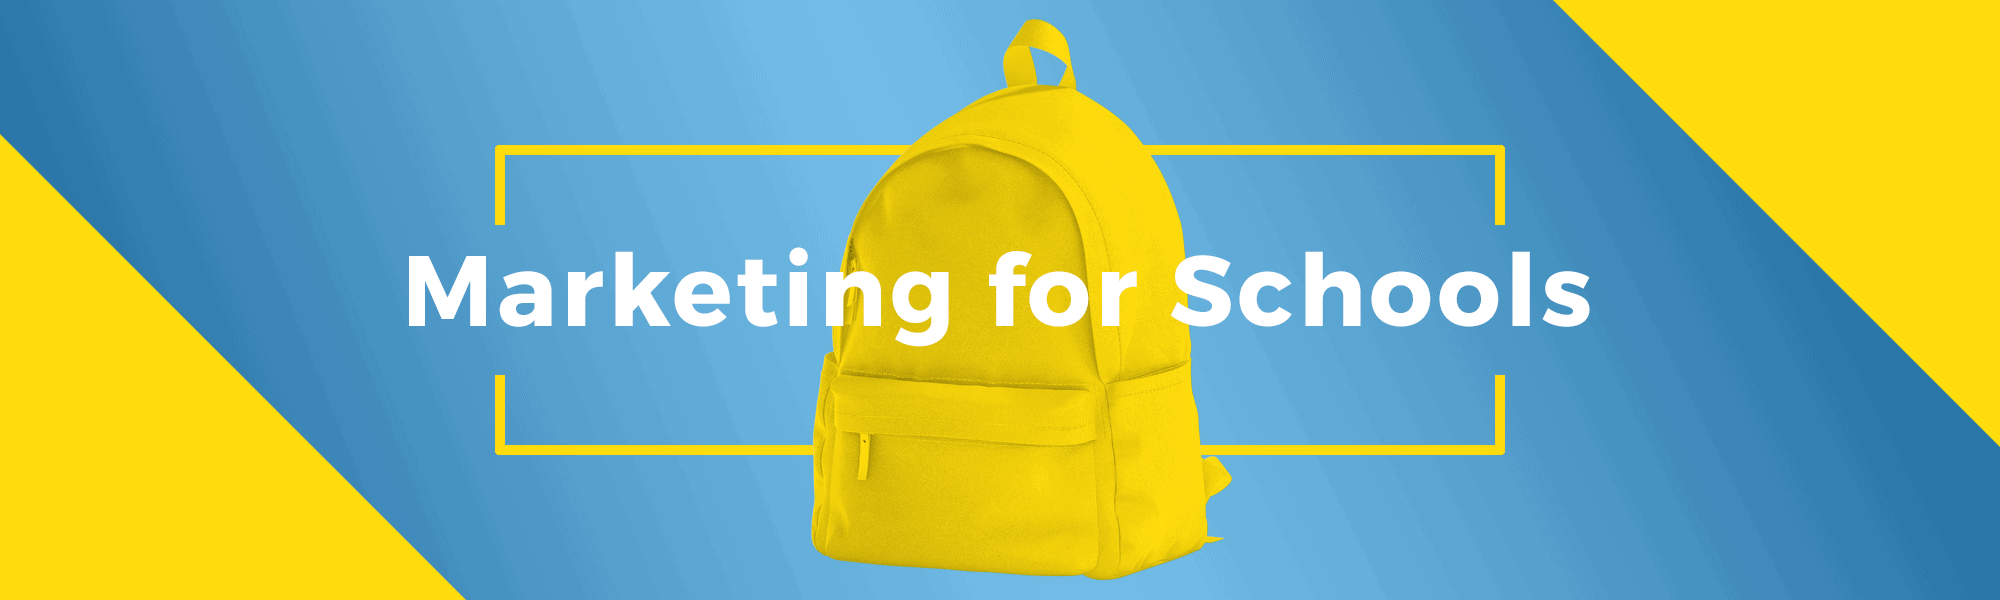 M2F Banners_MarketingForSchools